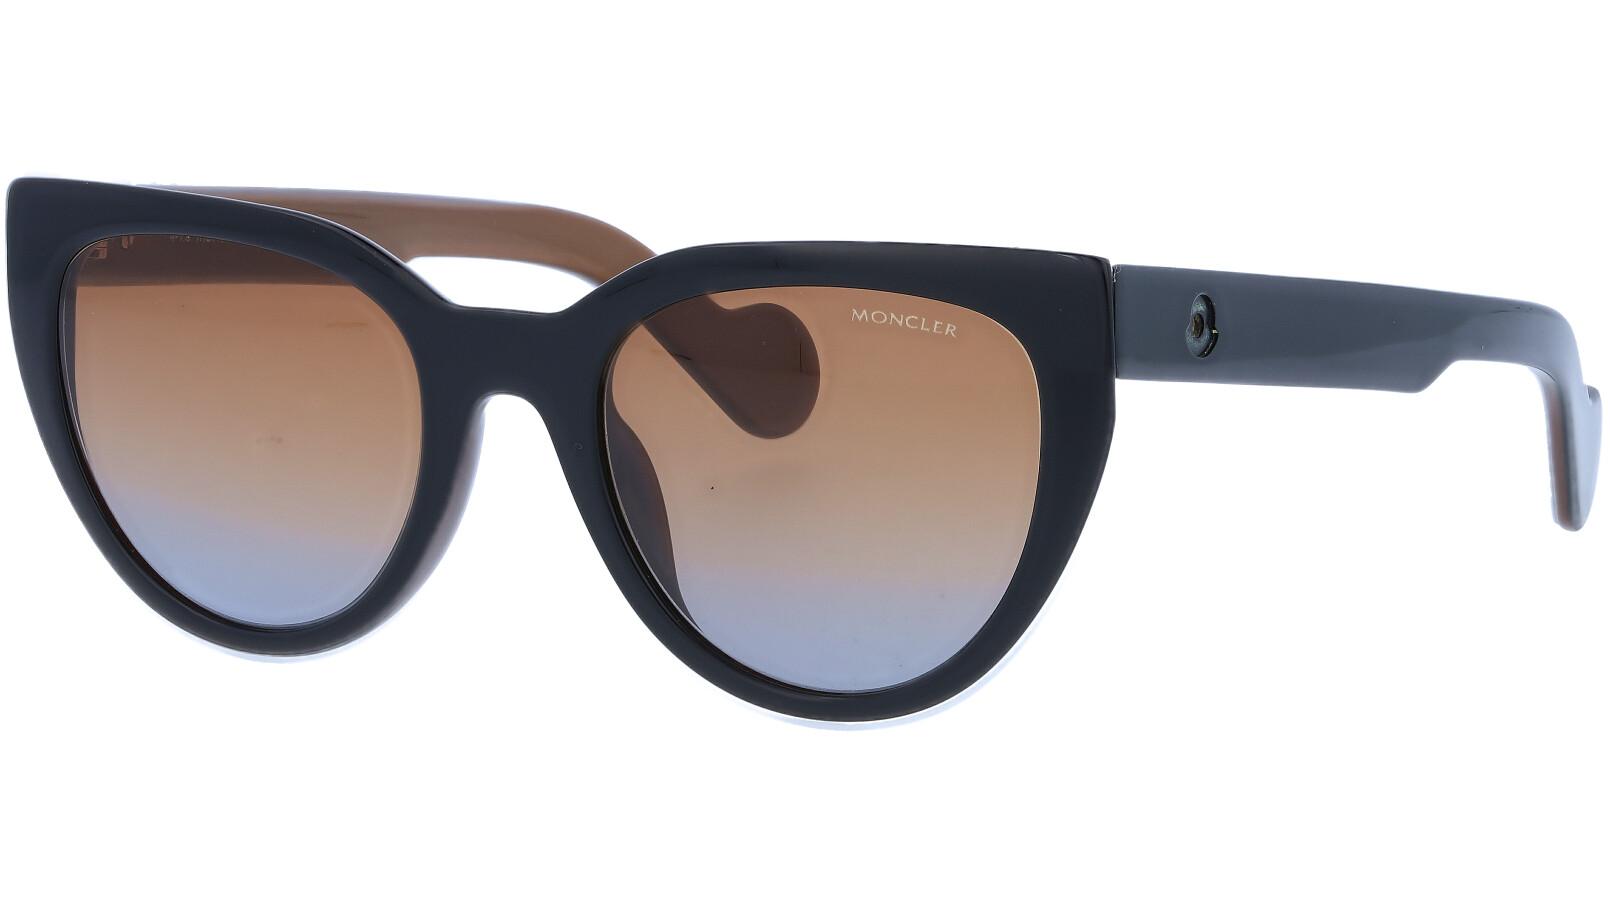 Moncler ML0076S 05F 50 Black Sunglasses